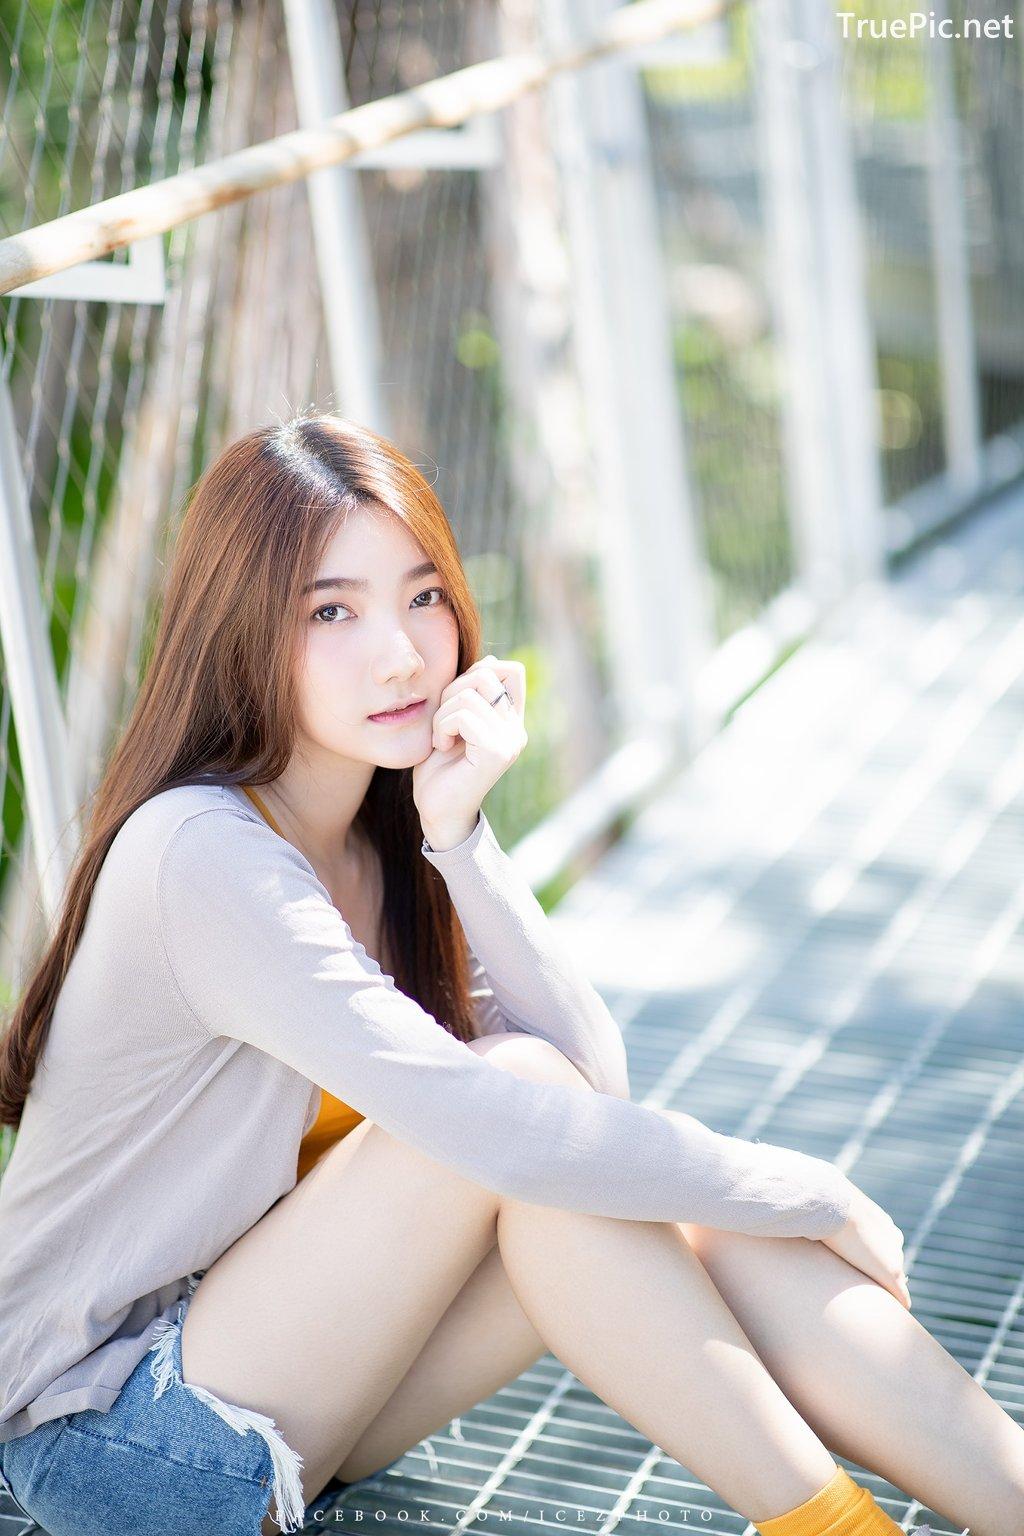 Image-Thailand-Cute-Model-Creammy-Chanama-Beautiful-Angel-In-Flower-Garden-TruePic.net- Picture-8